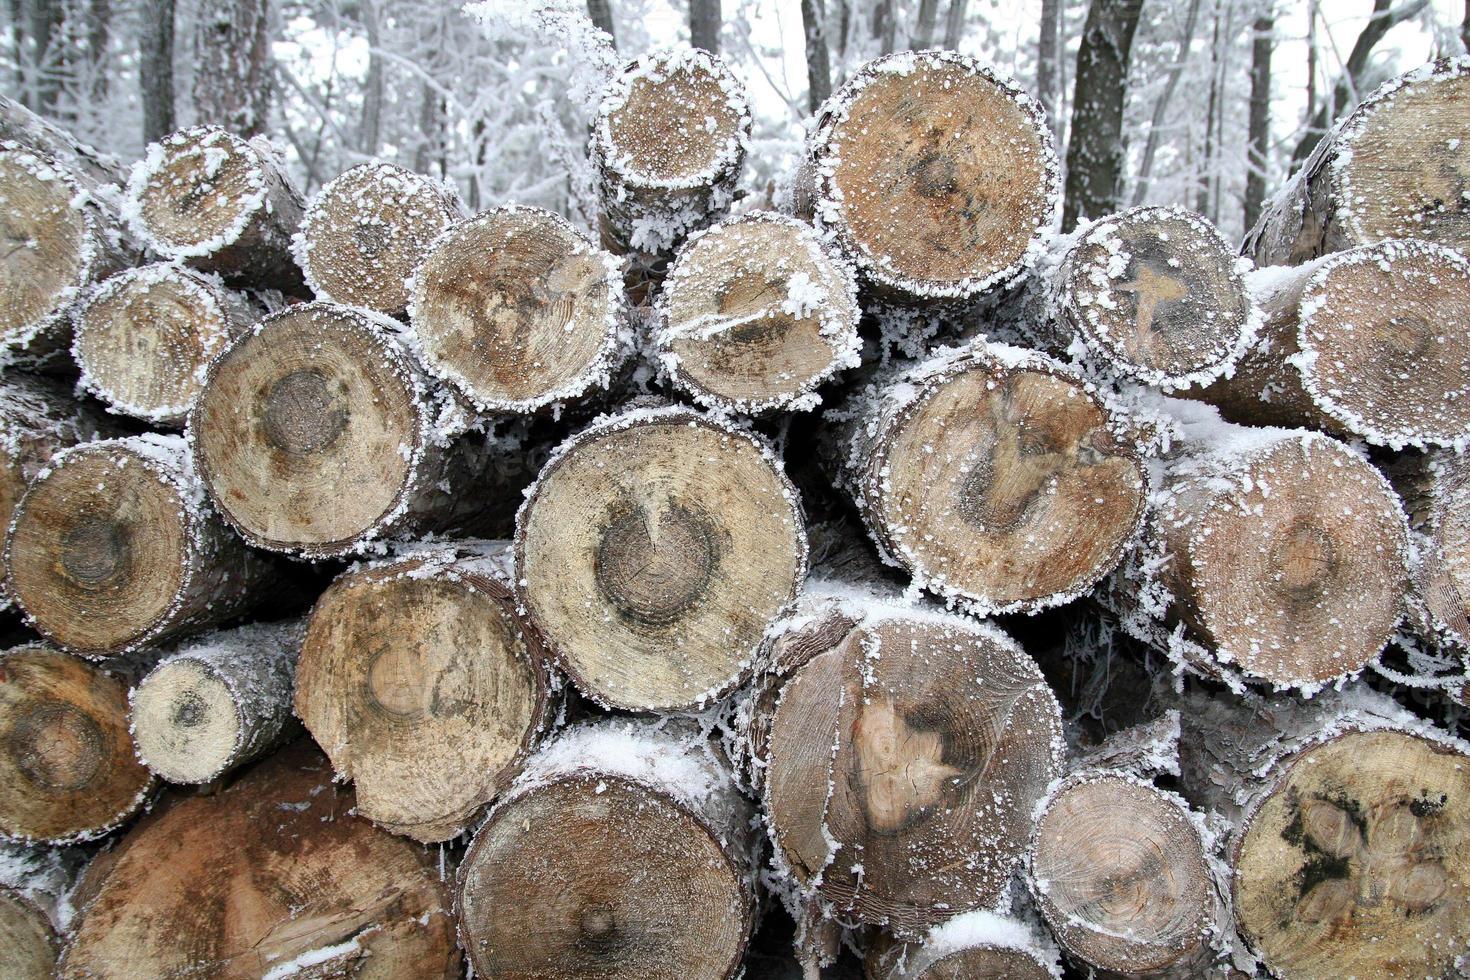 boomstronk in de winter. foto